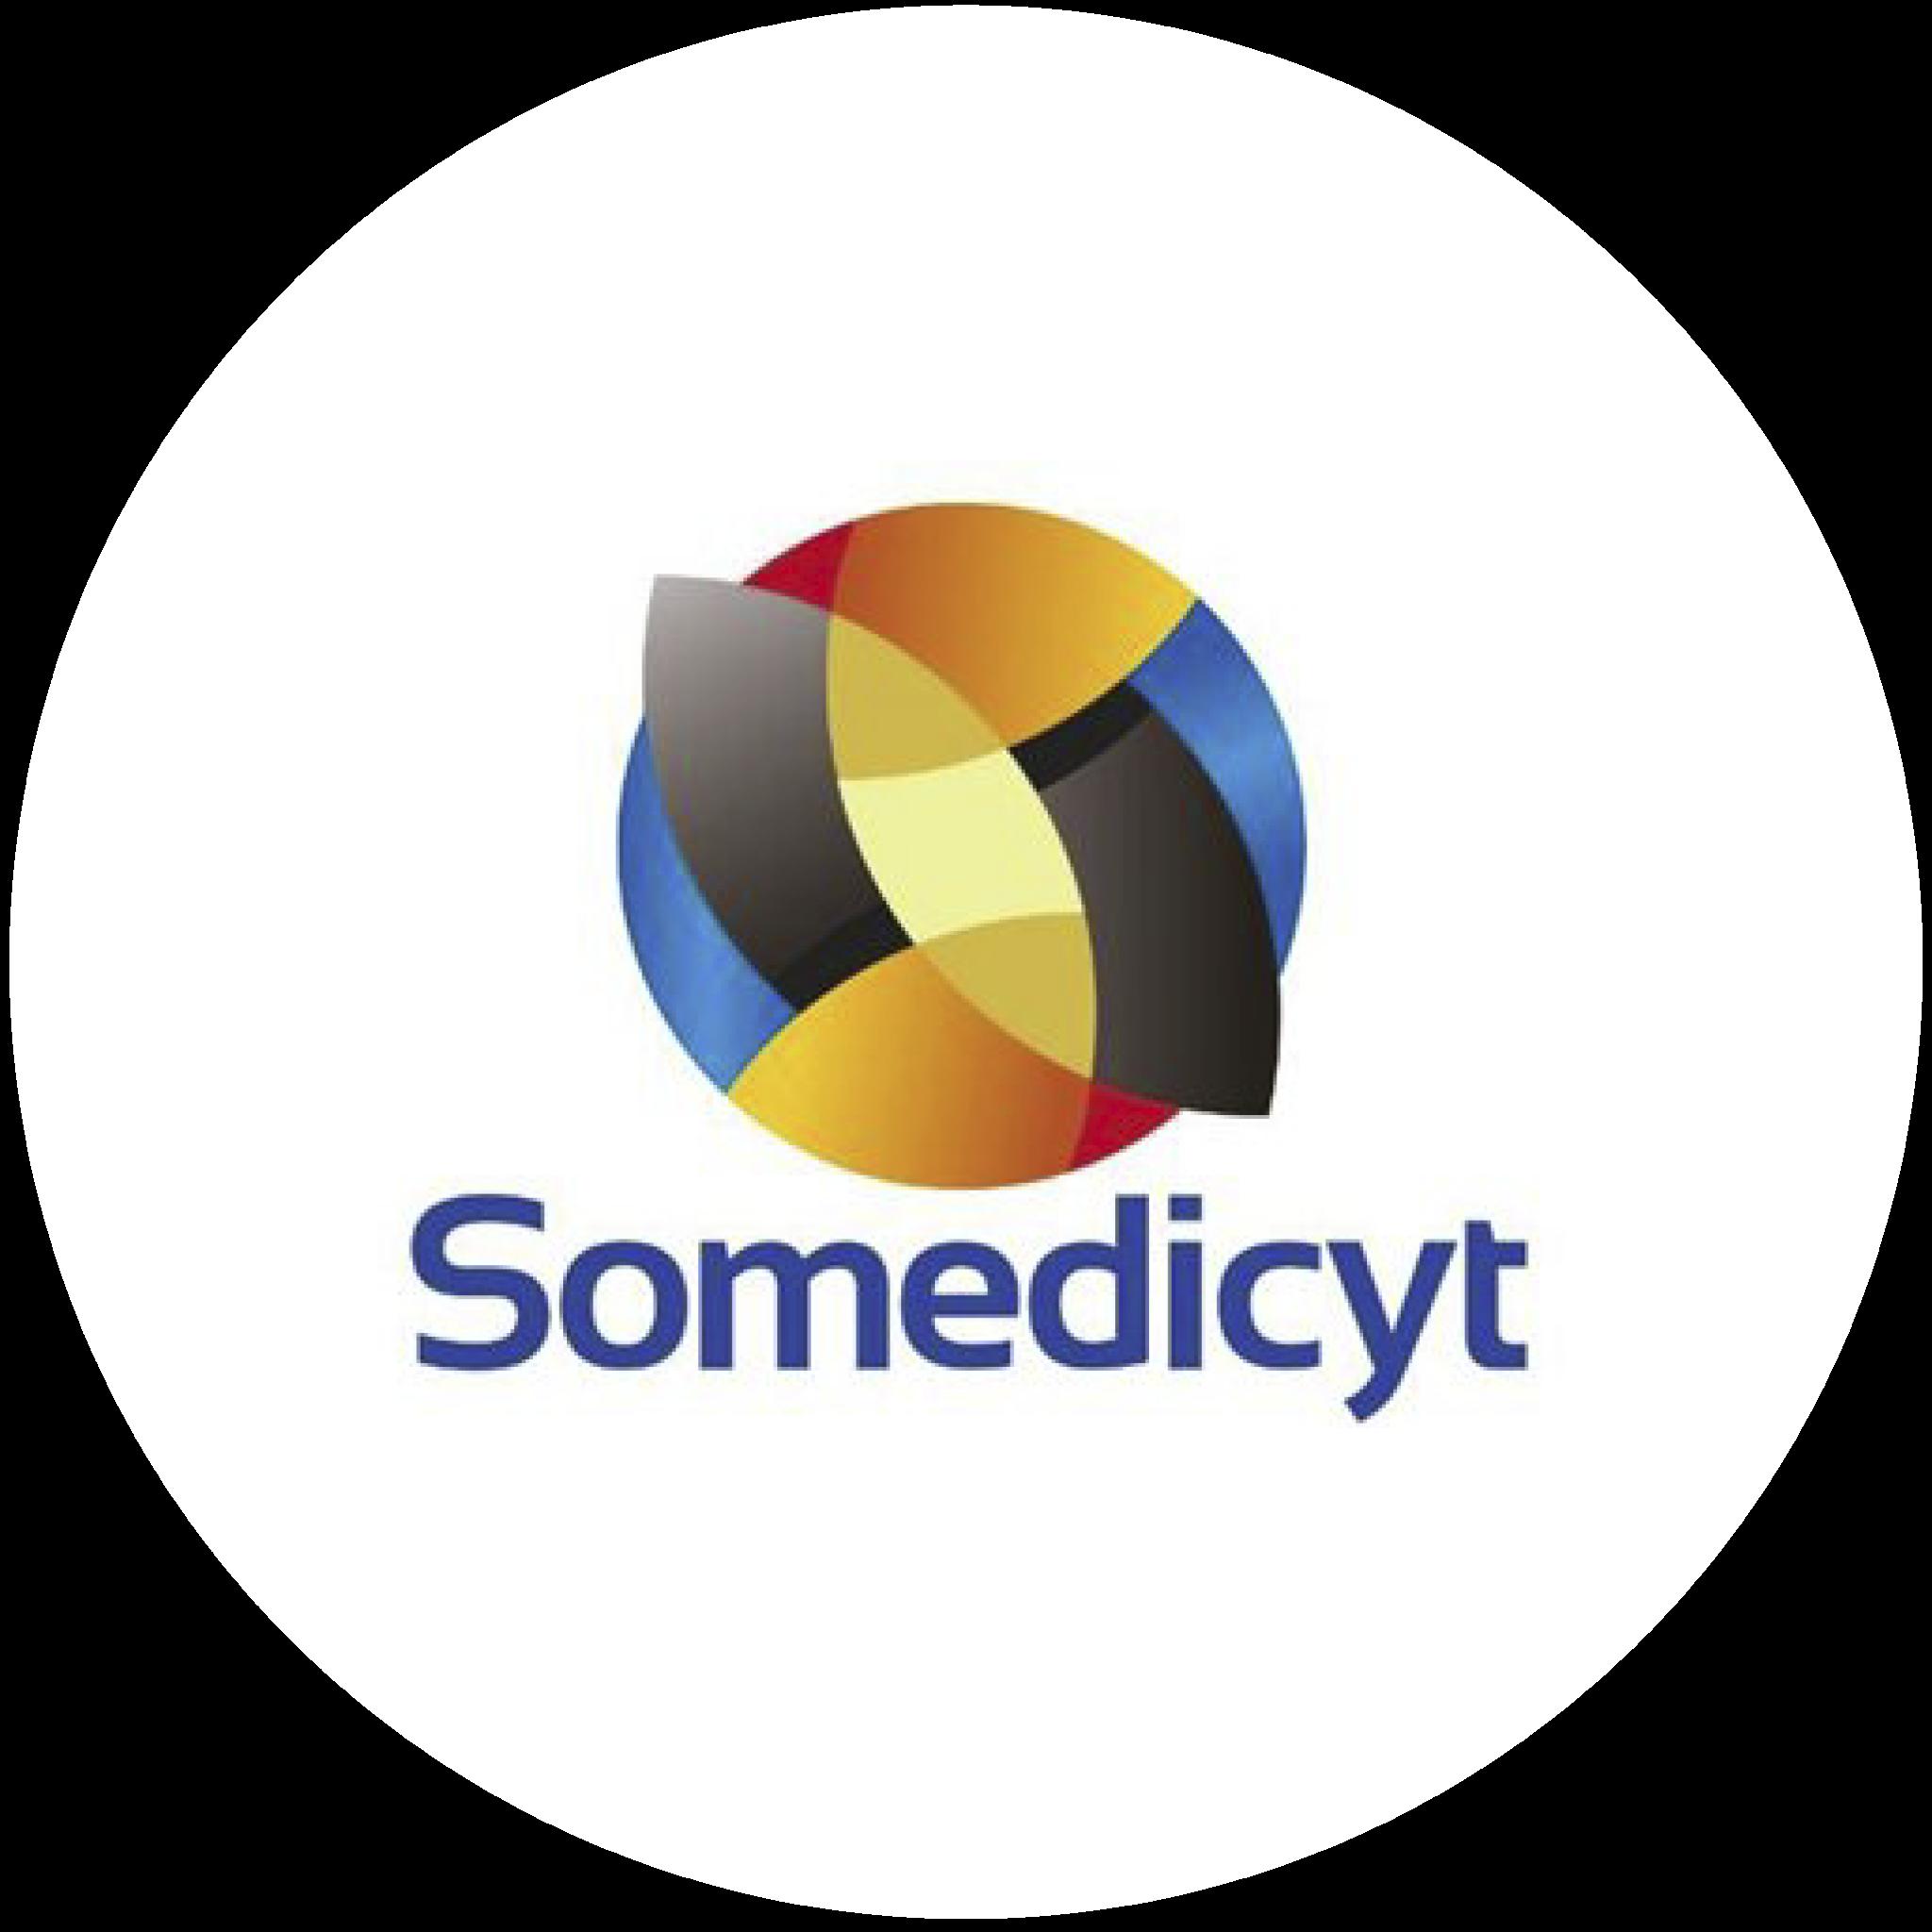 E_Somedicyt